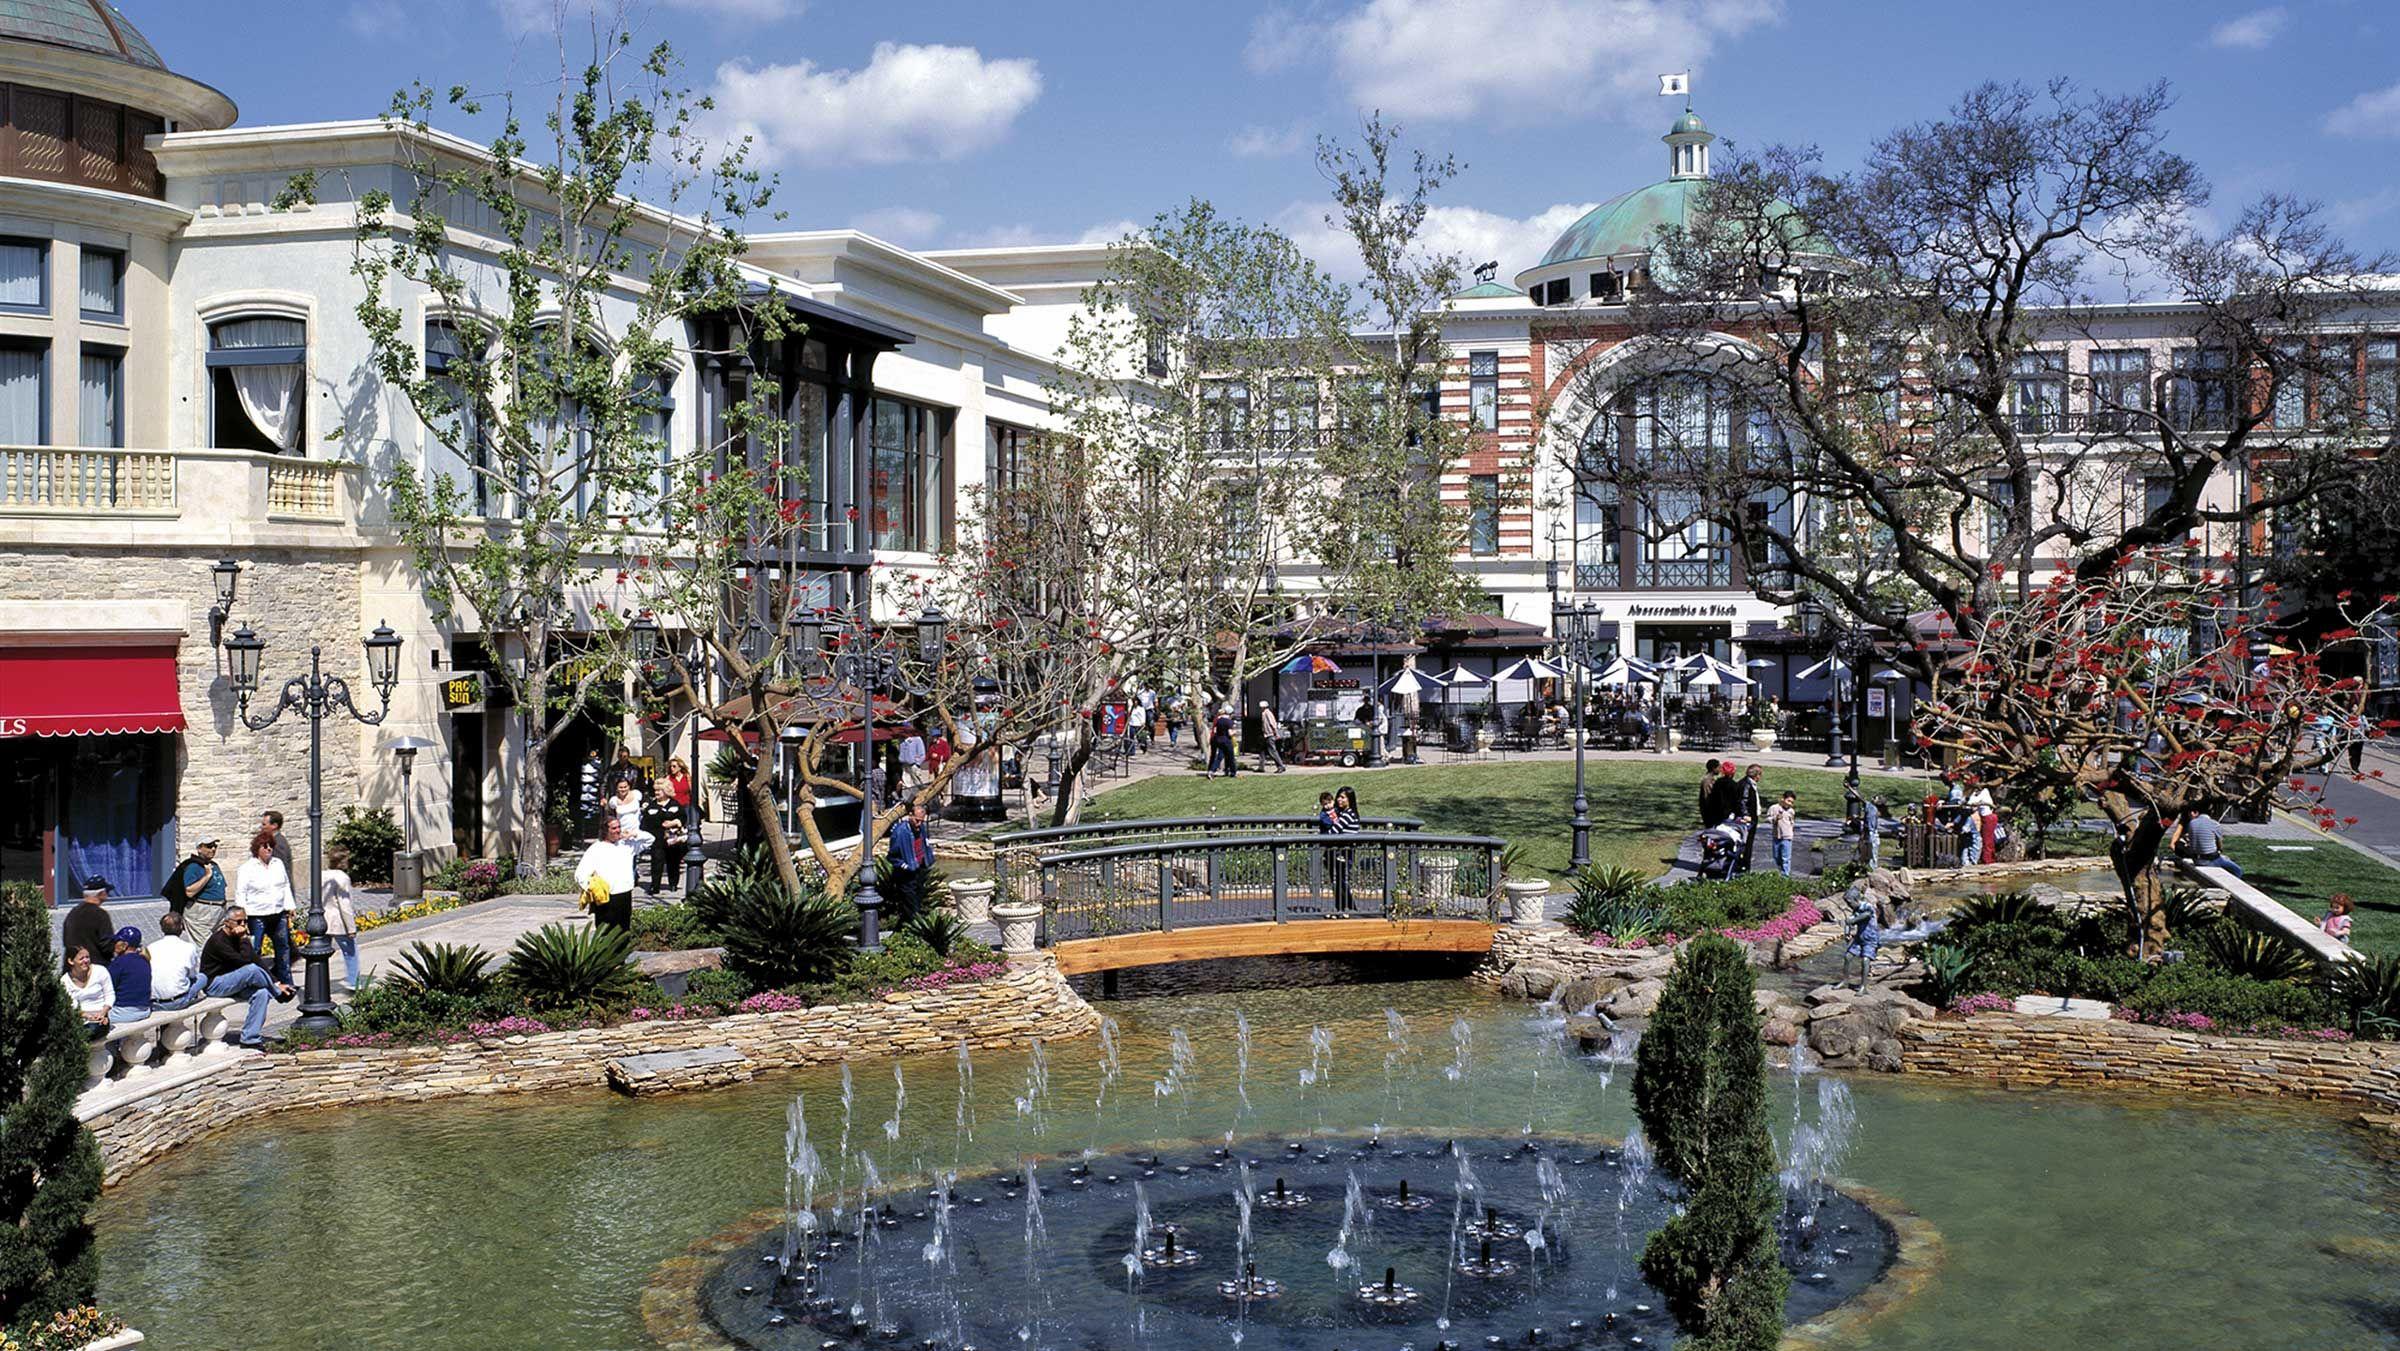 Grove fountain day grove street mall canal